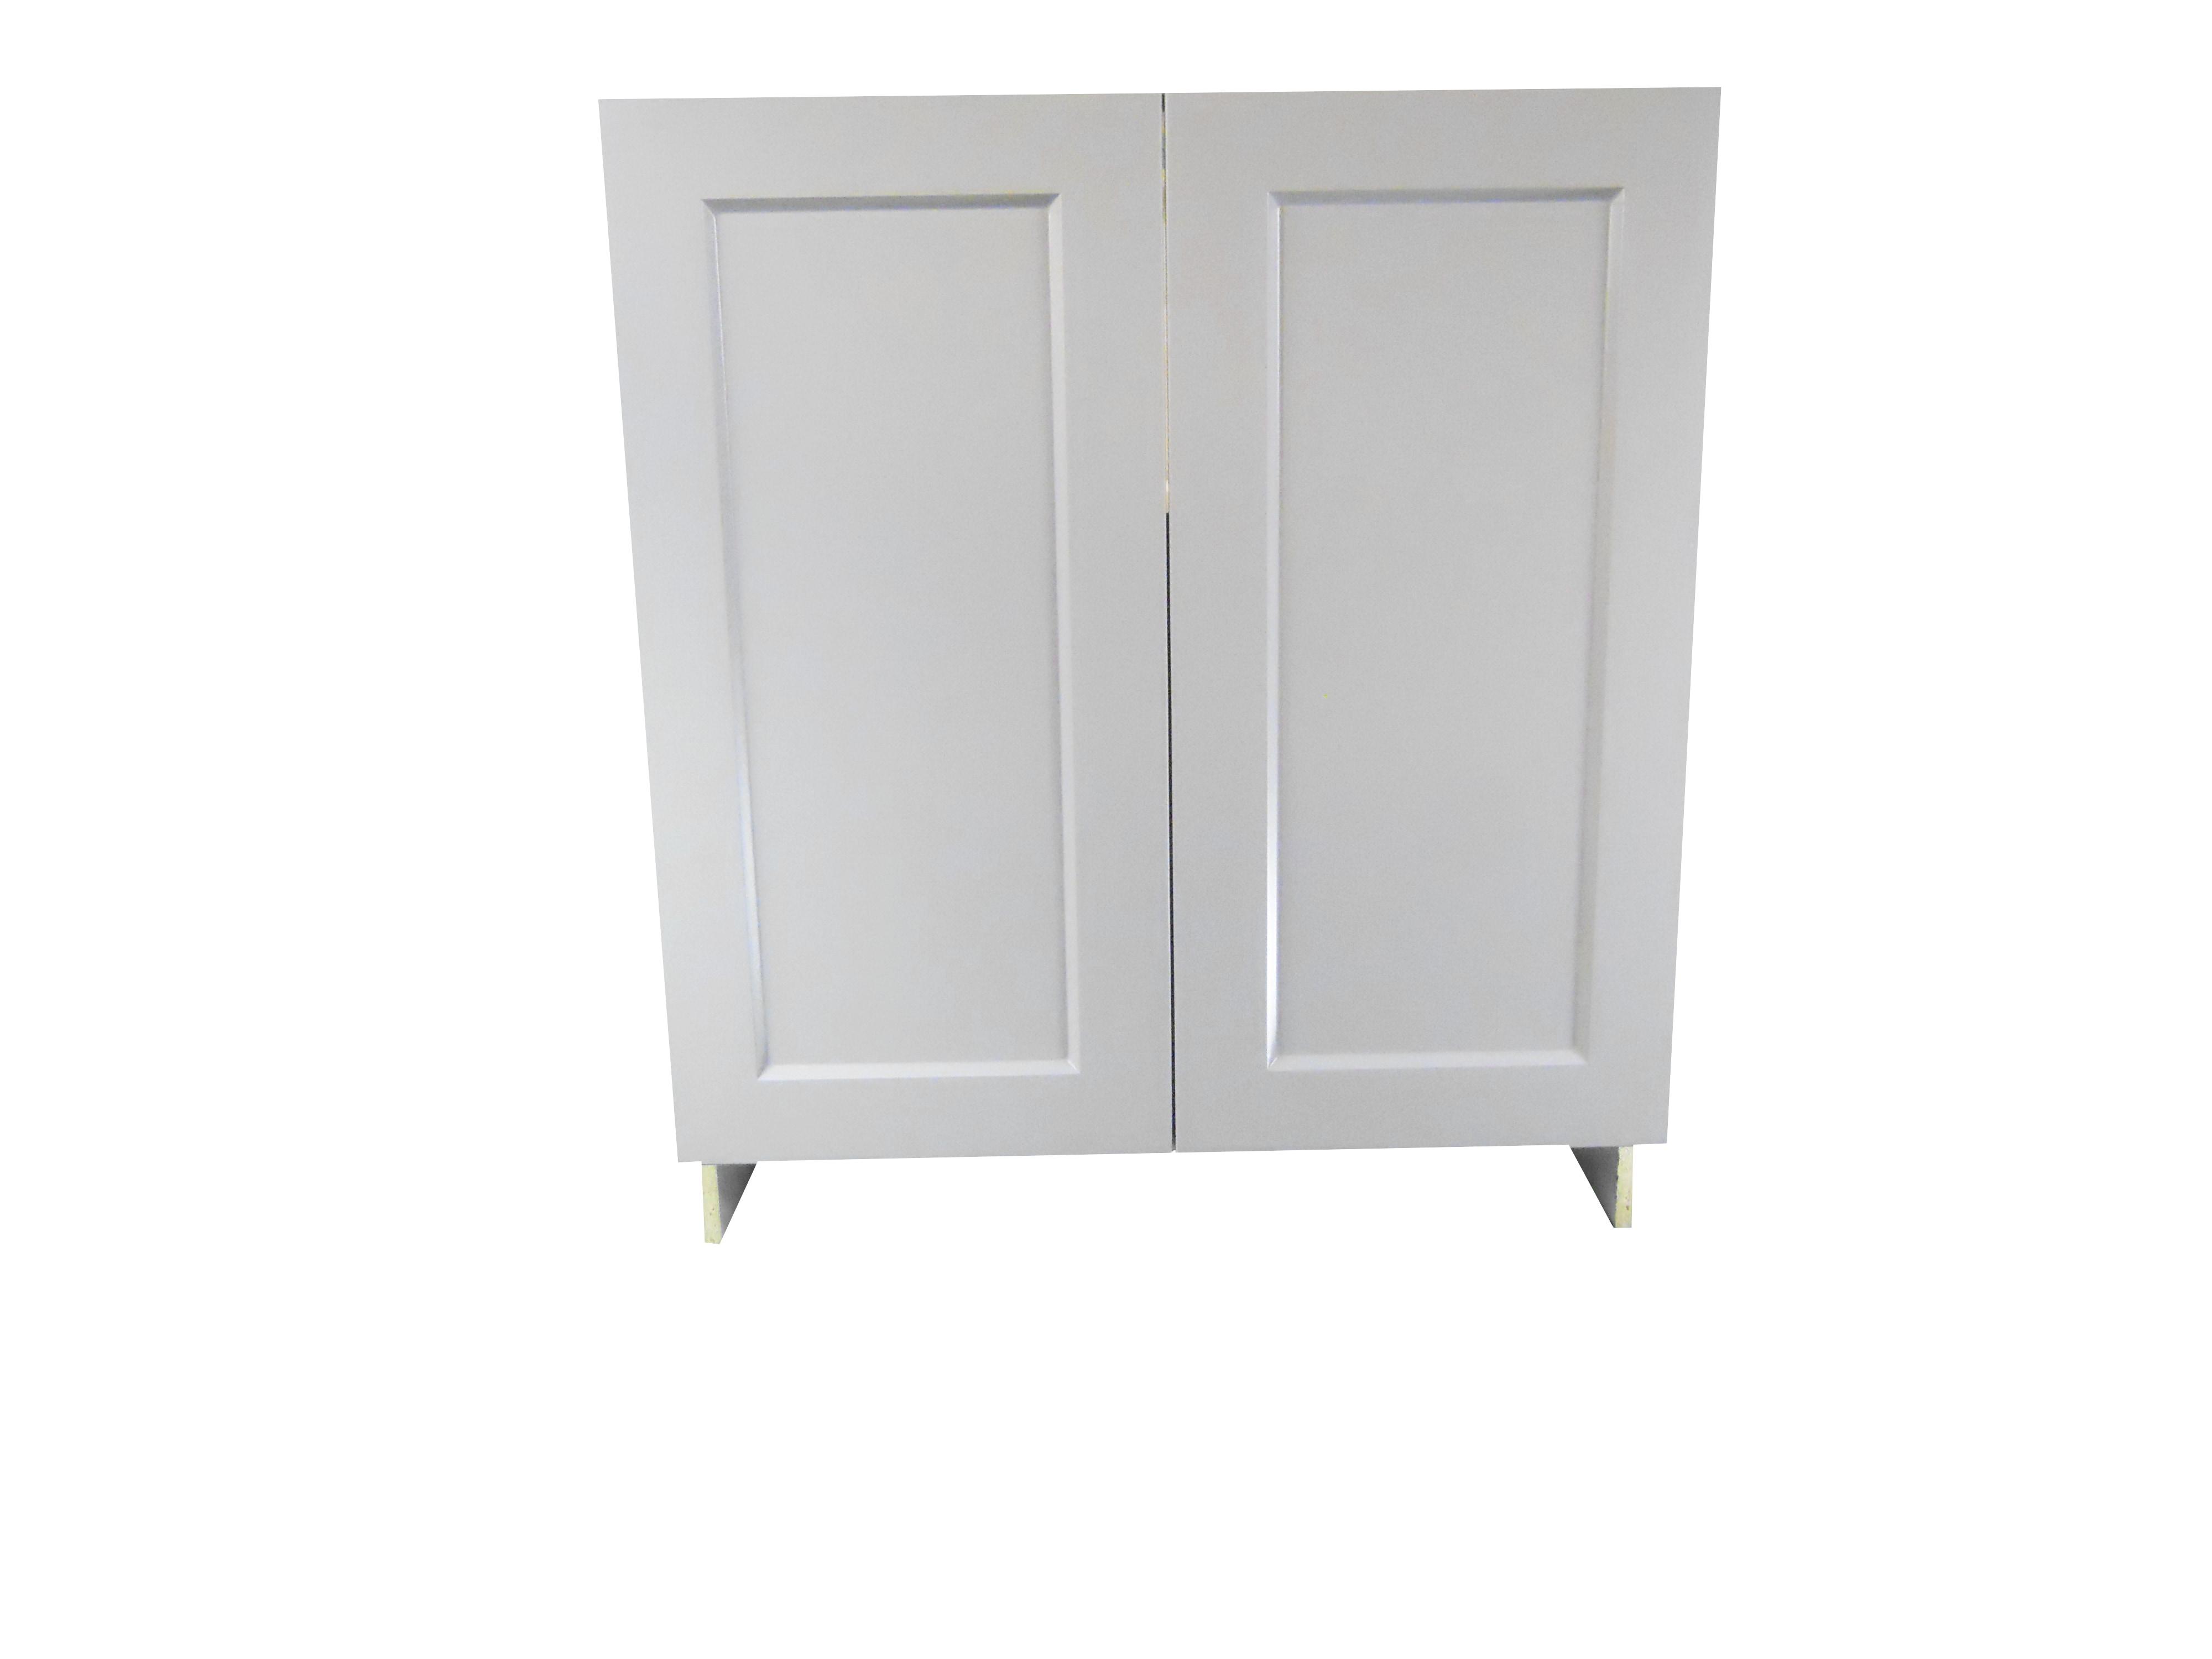 Base Cabinet With 2 Door / Whistler Grey / Flat Panel Grey / 30 Whistler Grey 0